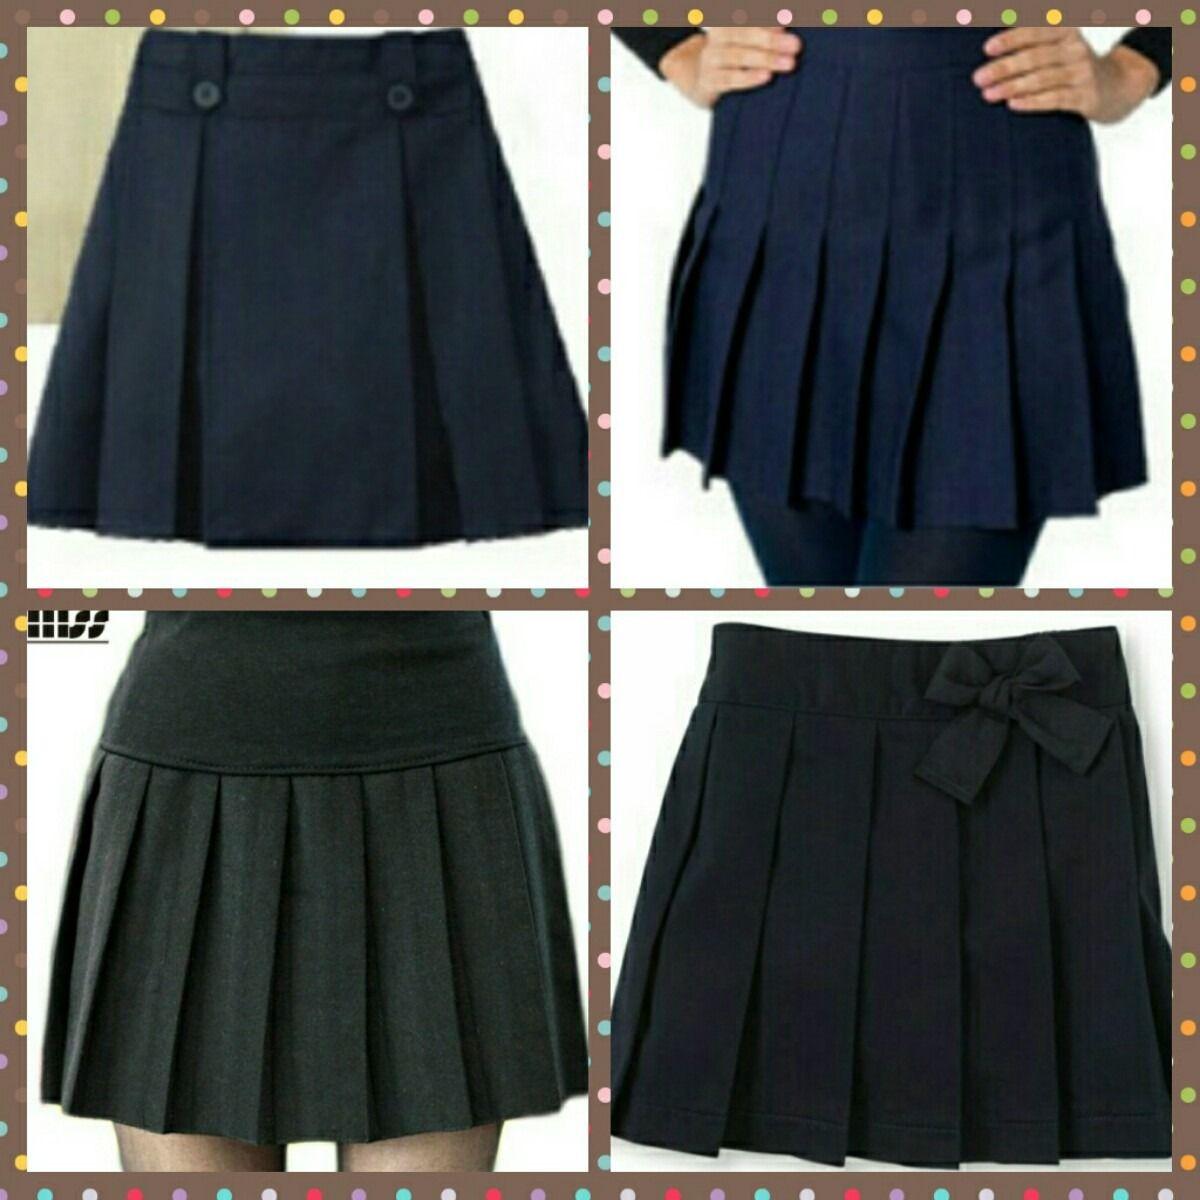 8ac945079f Modelos de falda escolar  escolar  falda  modelos  modelosdeFalda ...